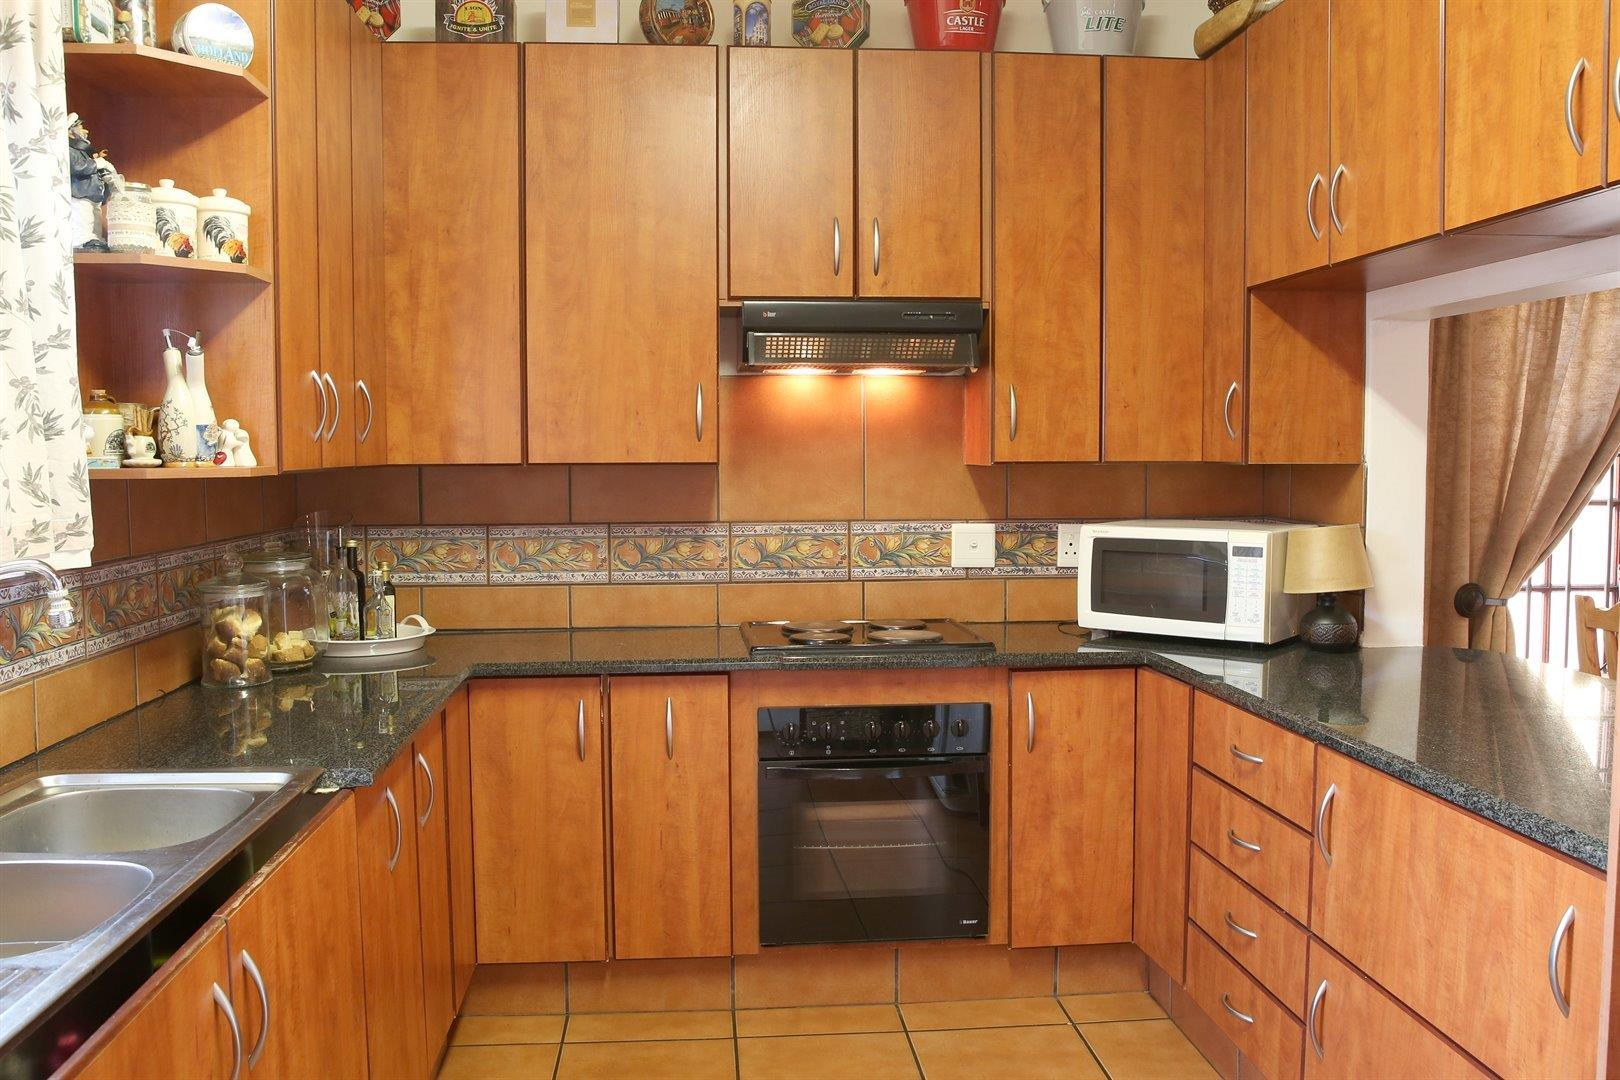 Rietvalleirand property for sale. Ref No: 13545797. Picture no 4